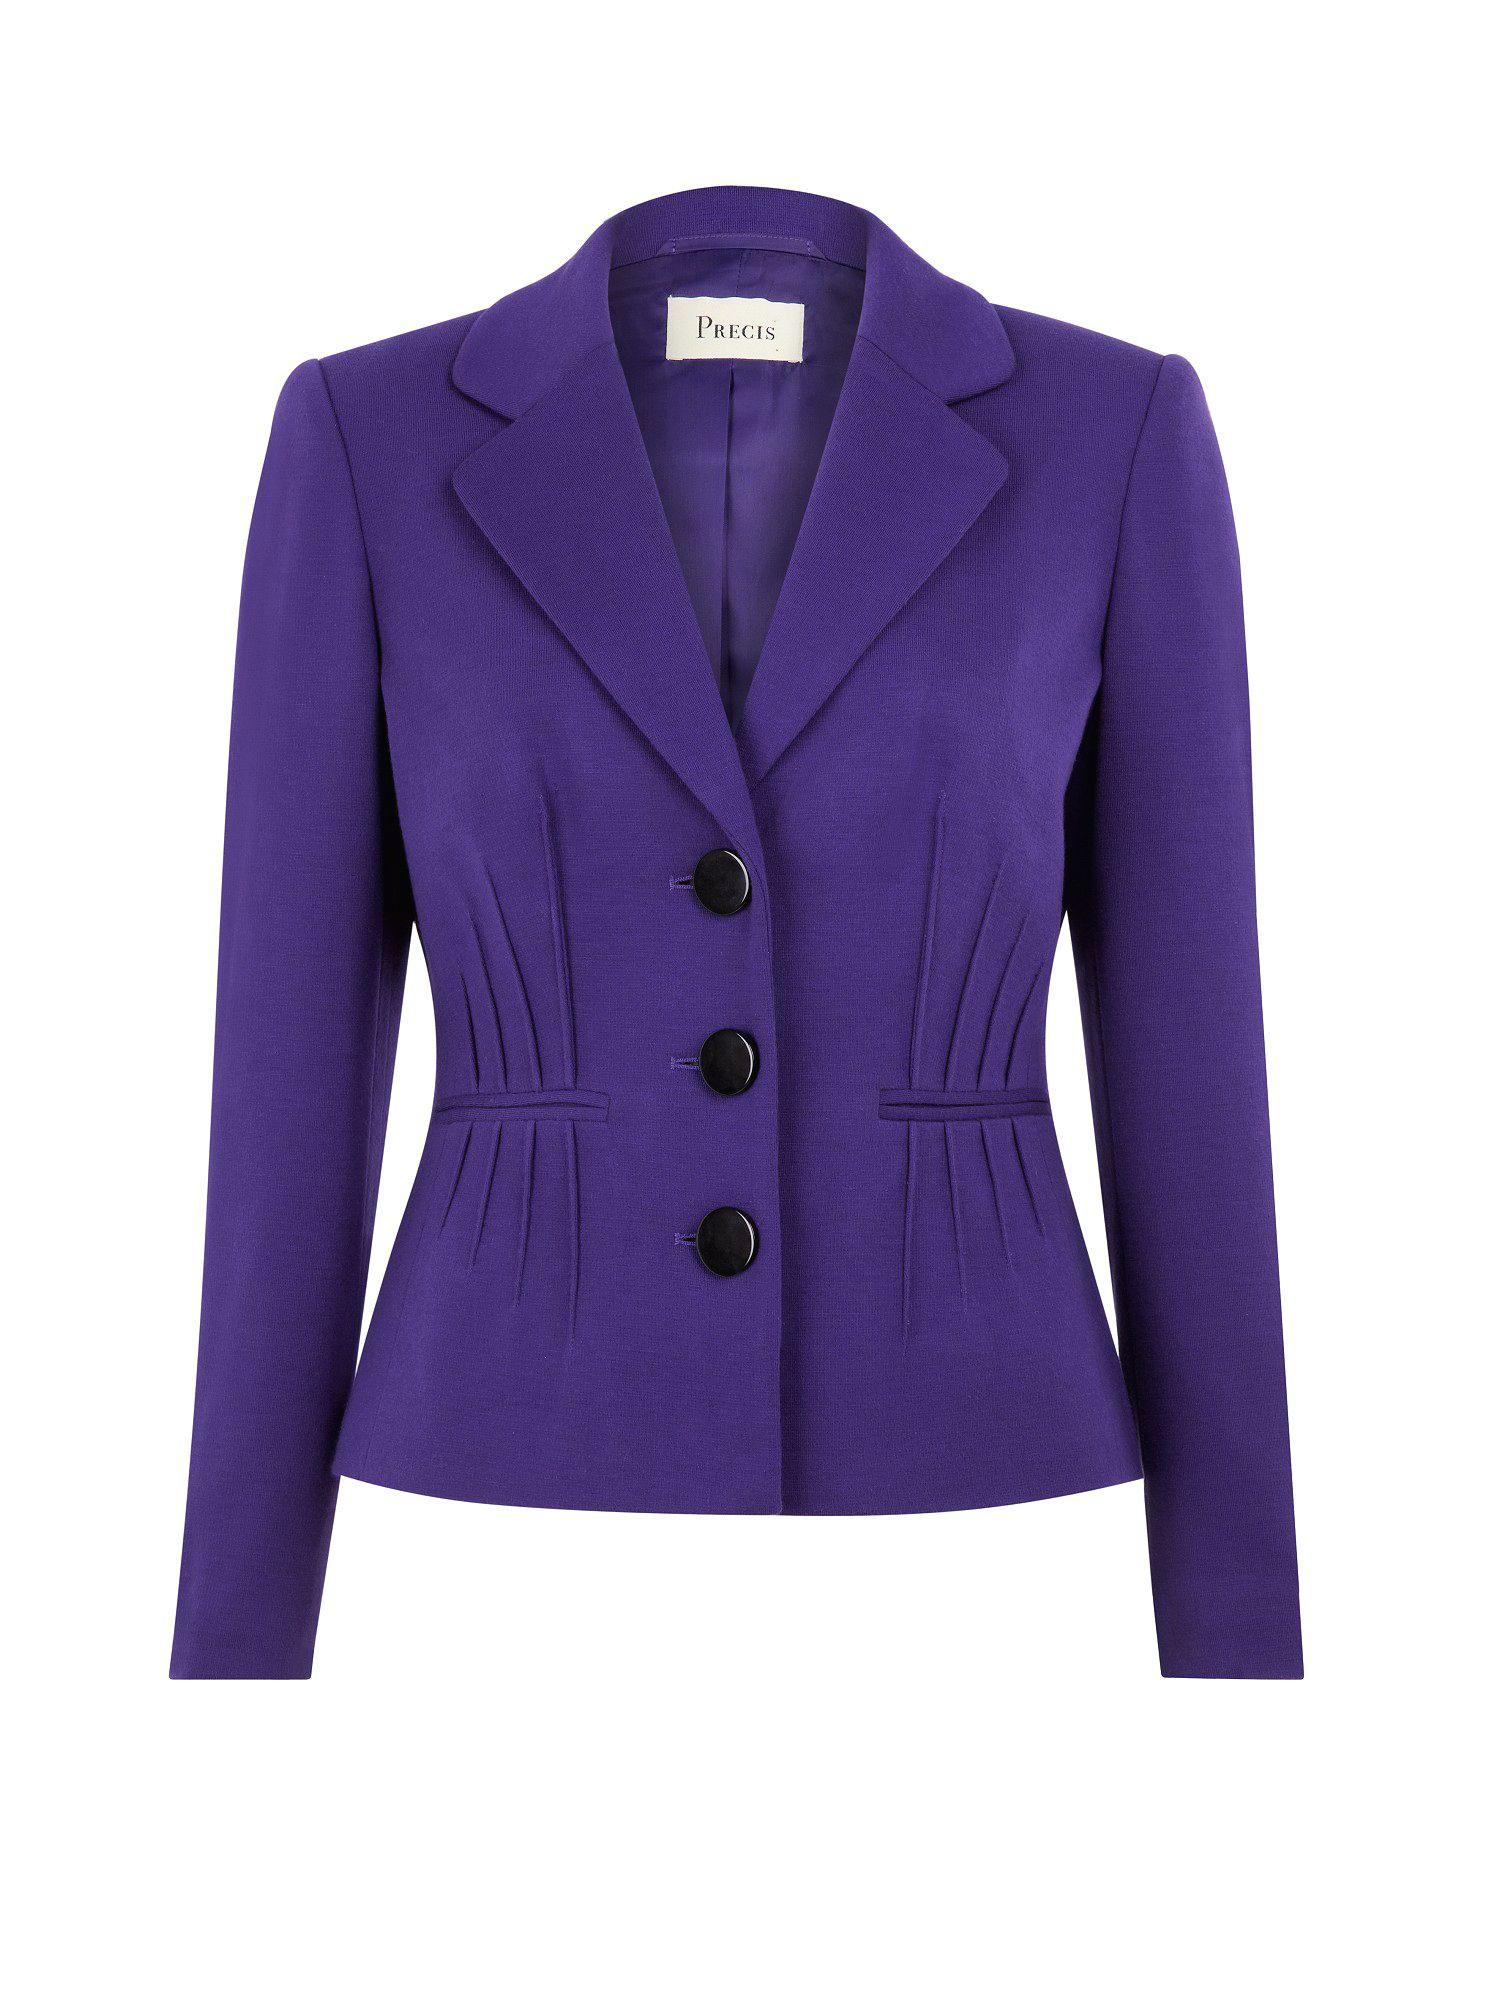 Precis Petite Purple Pintuck Jacket In Purple | Lyst